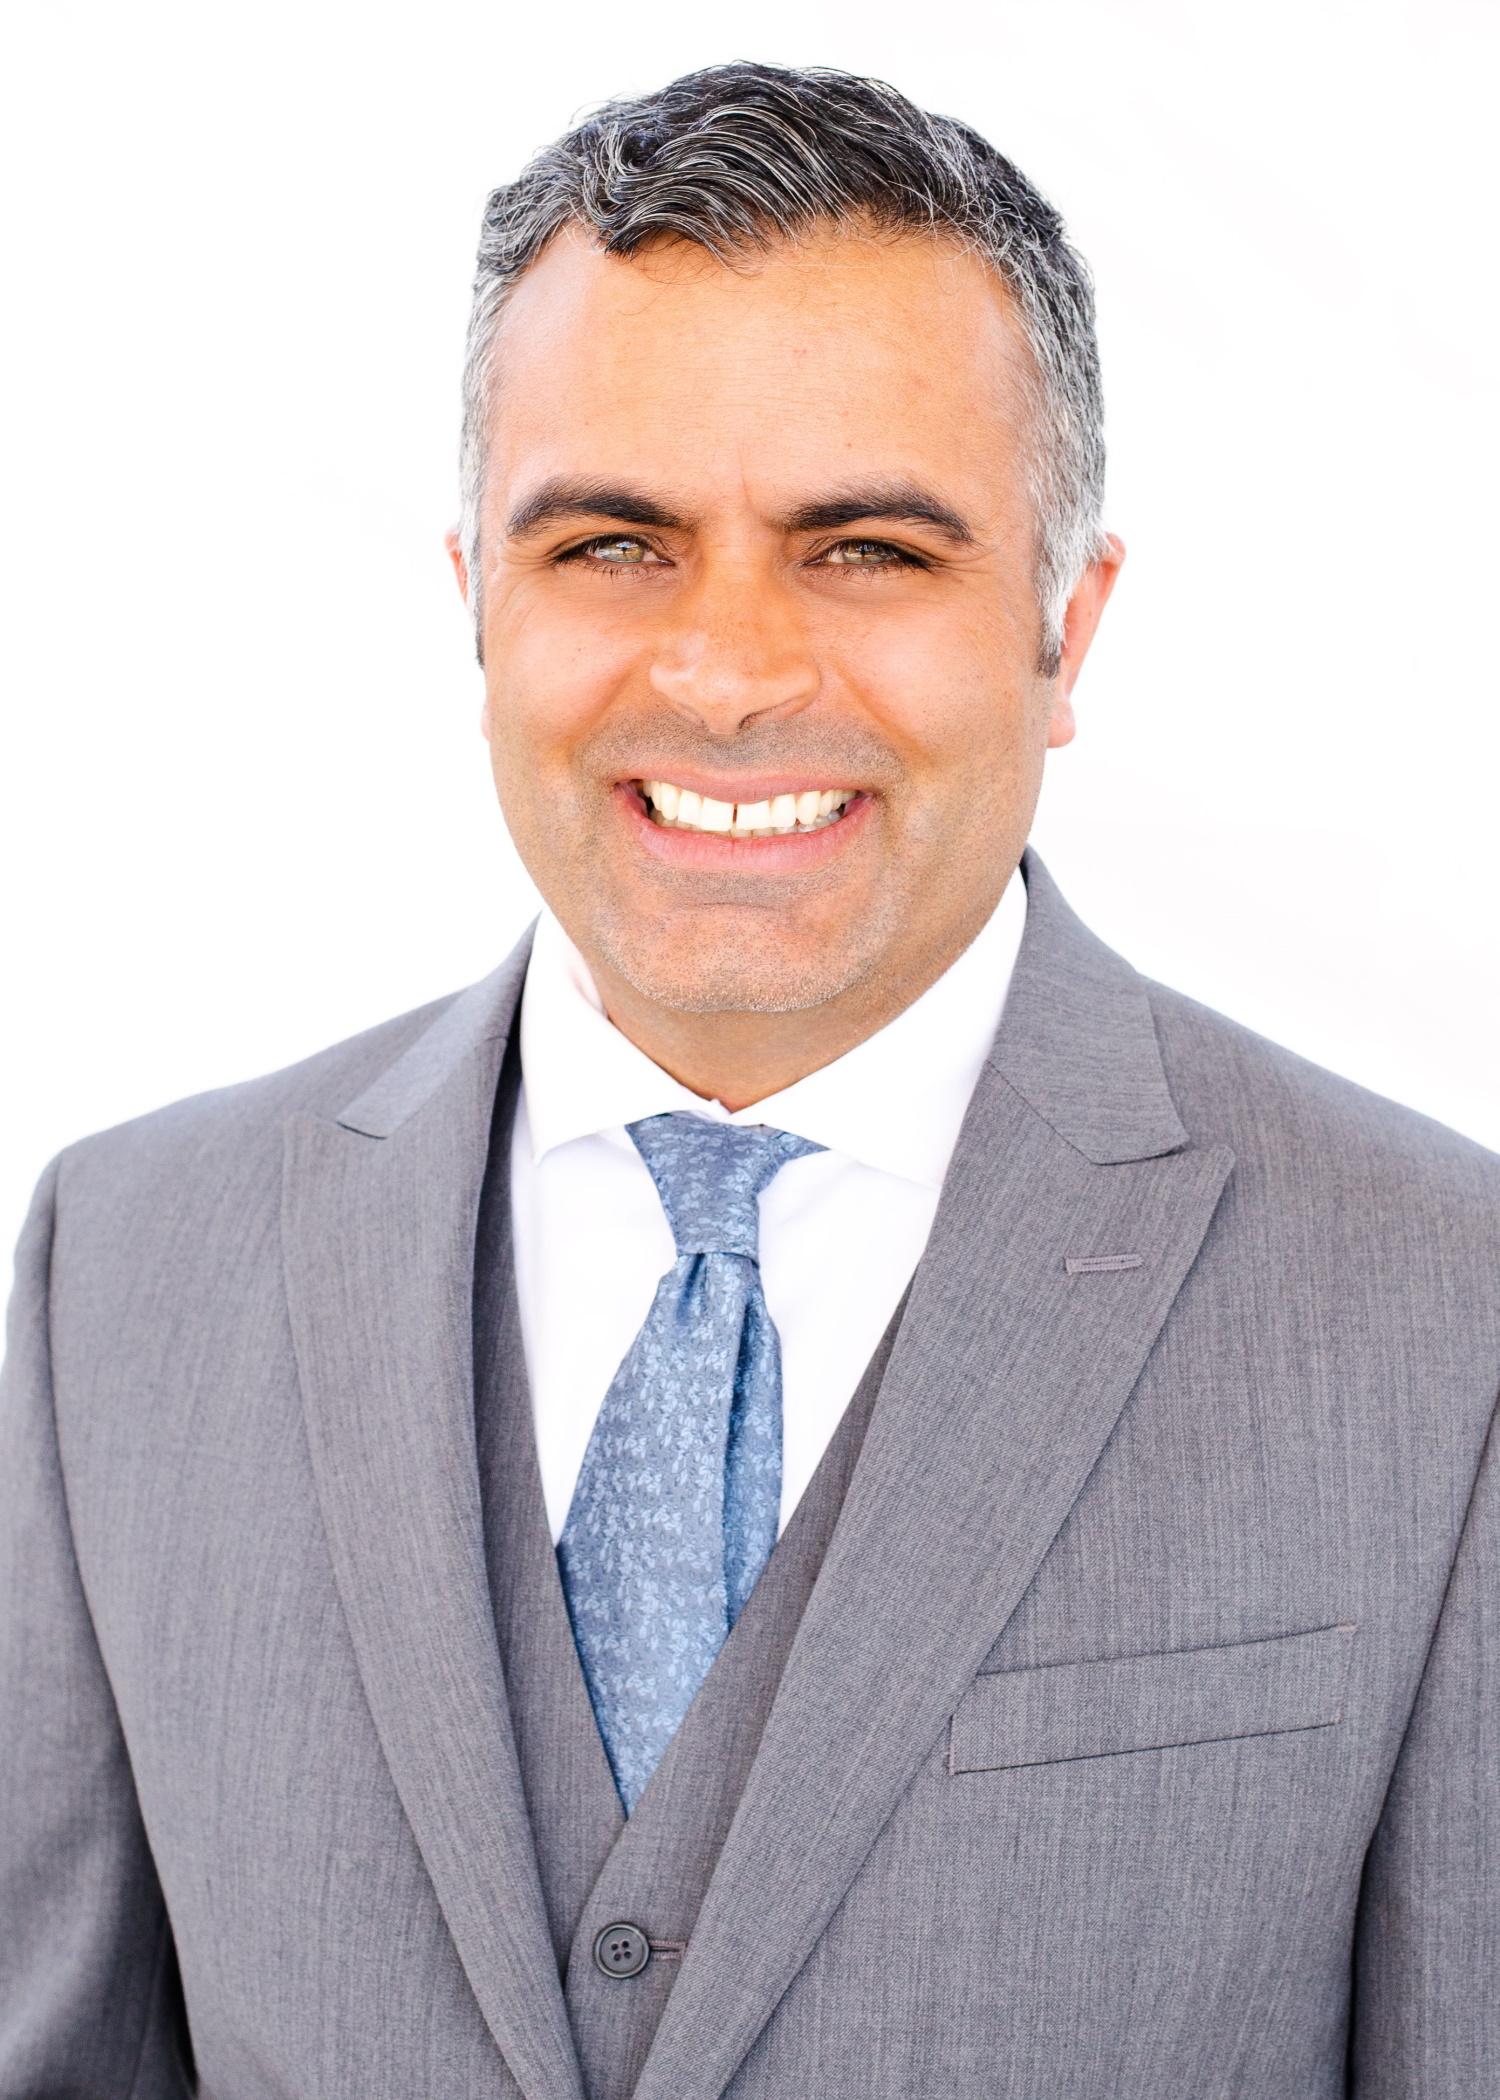 Kiron Kathari - attorney with Livelihood Law